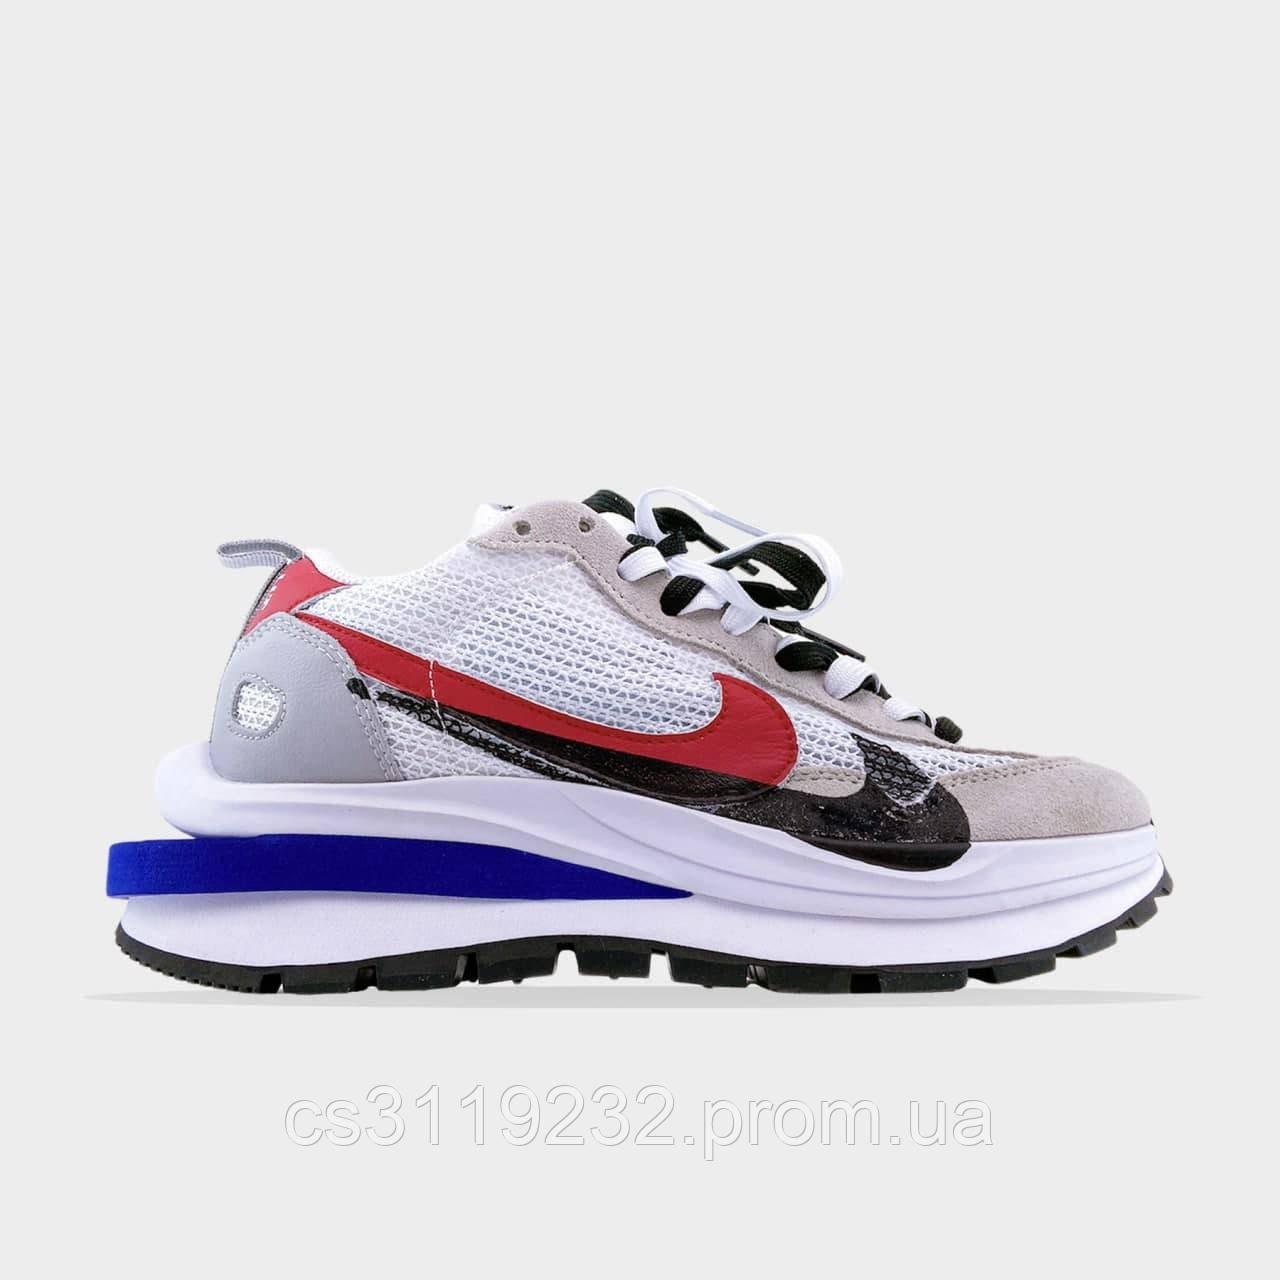 Женские кроссовки Nike x Sacai VaporWaffle White  (белые)